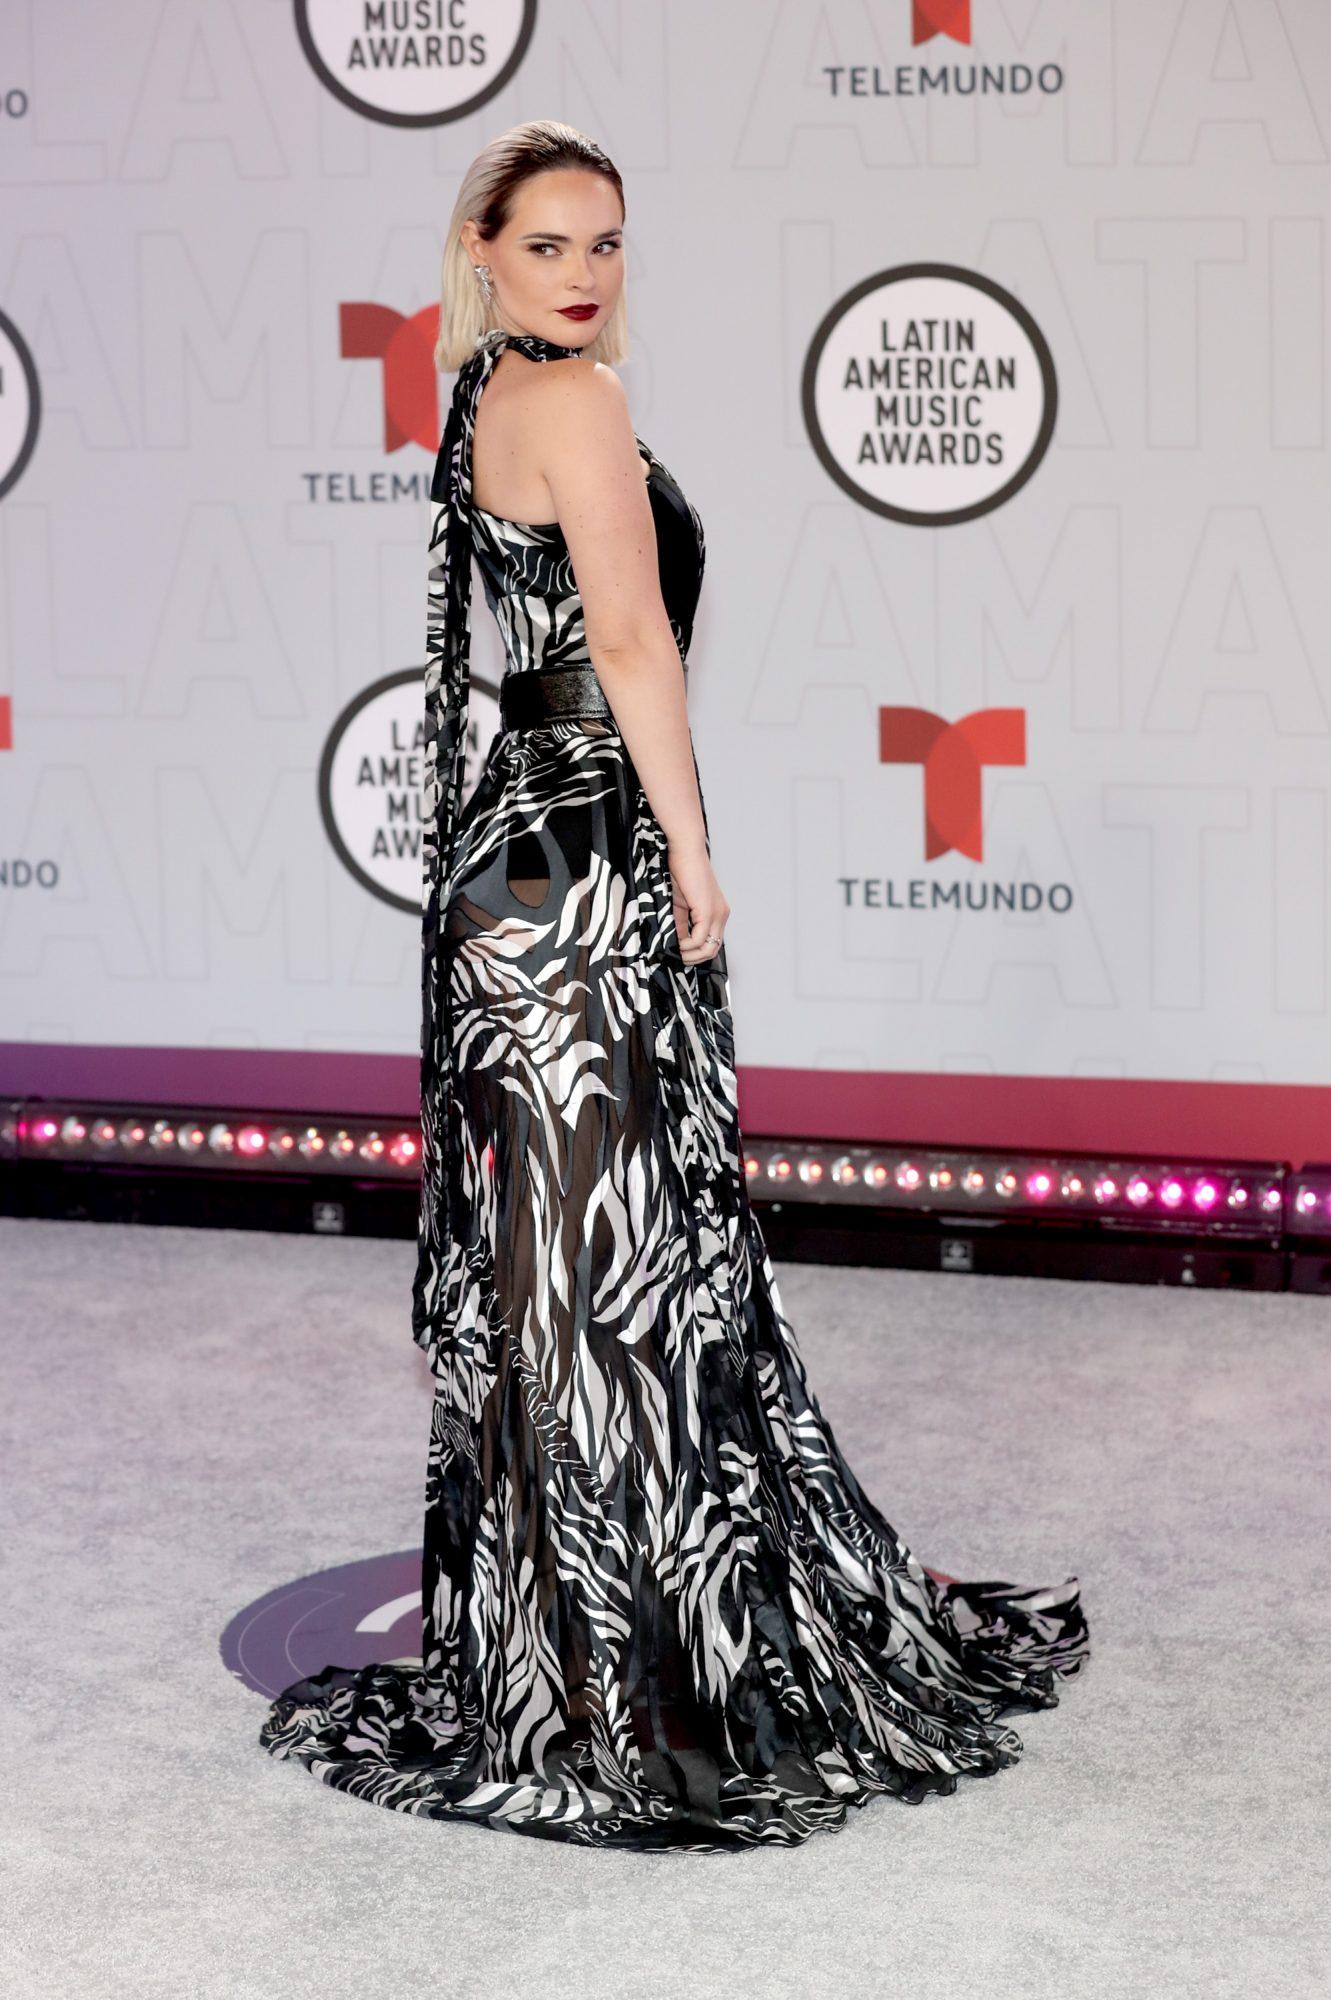 Fabiola Guajardo, Latin American Music Awards, look